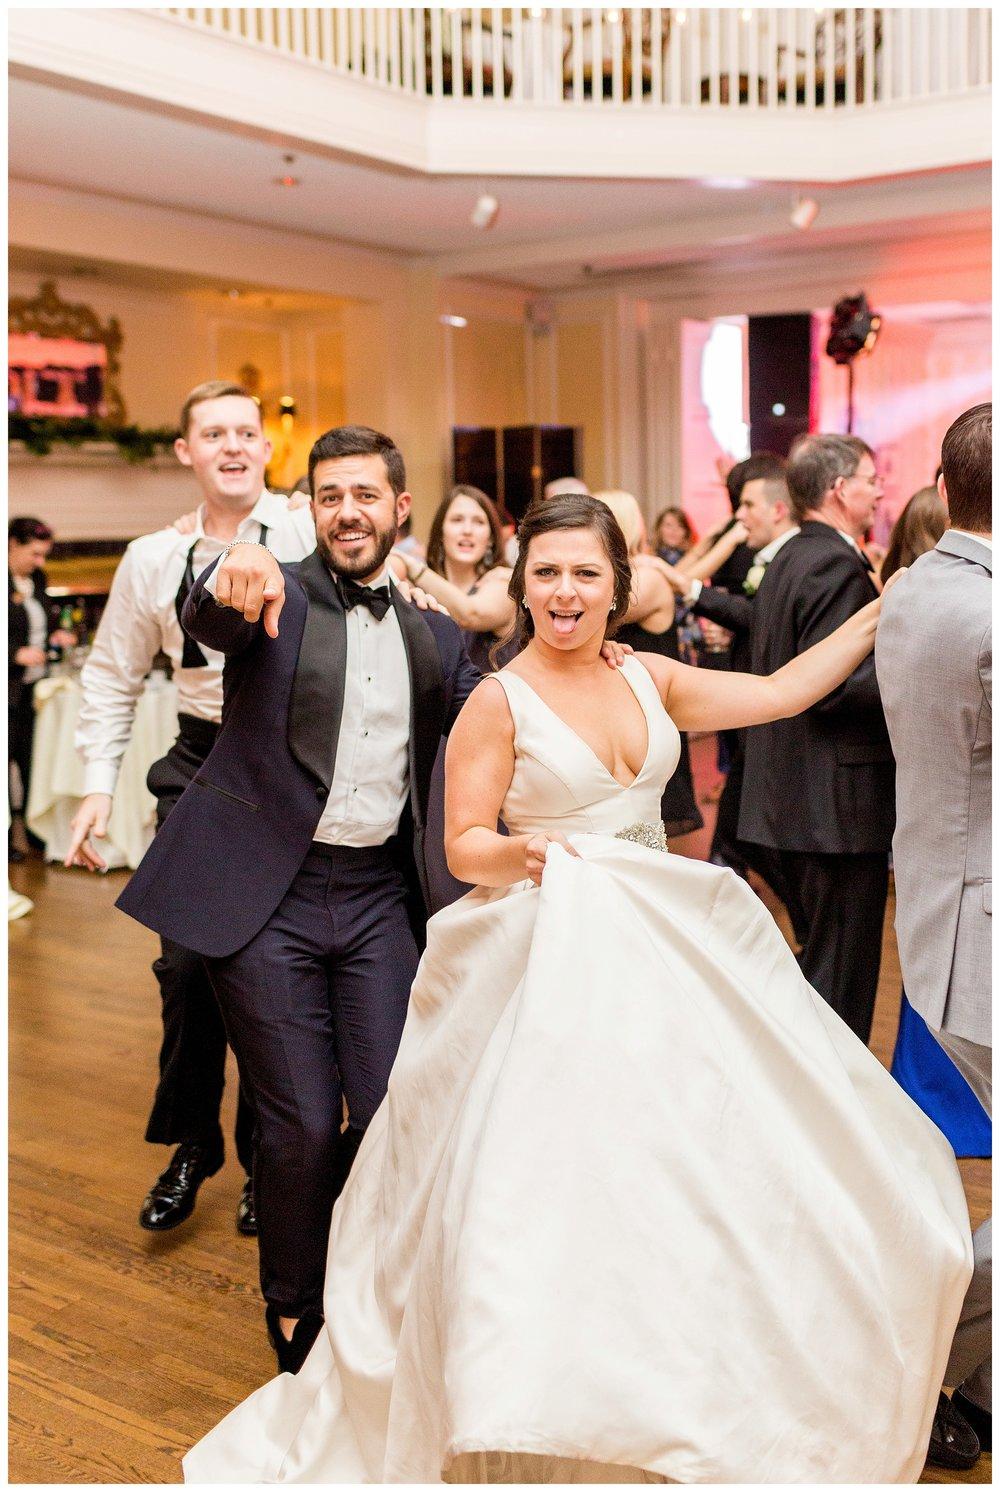 Country Club of Virginia Wedding | Richmond Wedding Photographer_0155.jpg